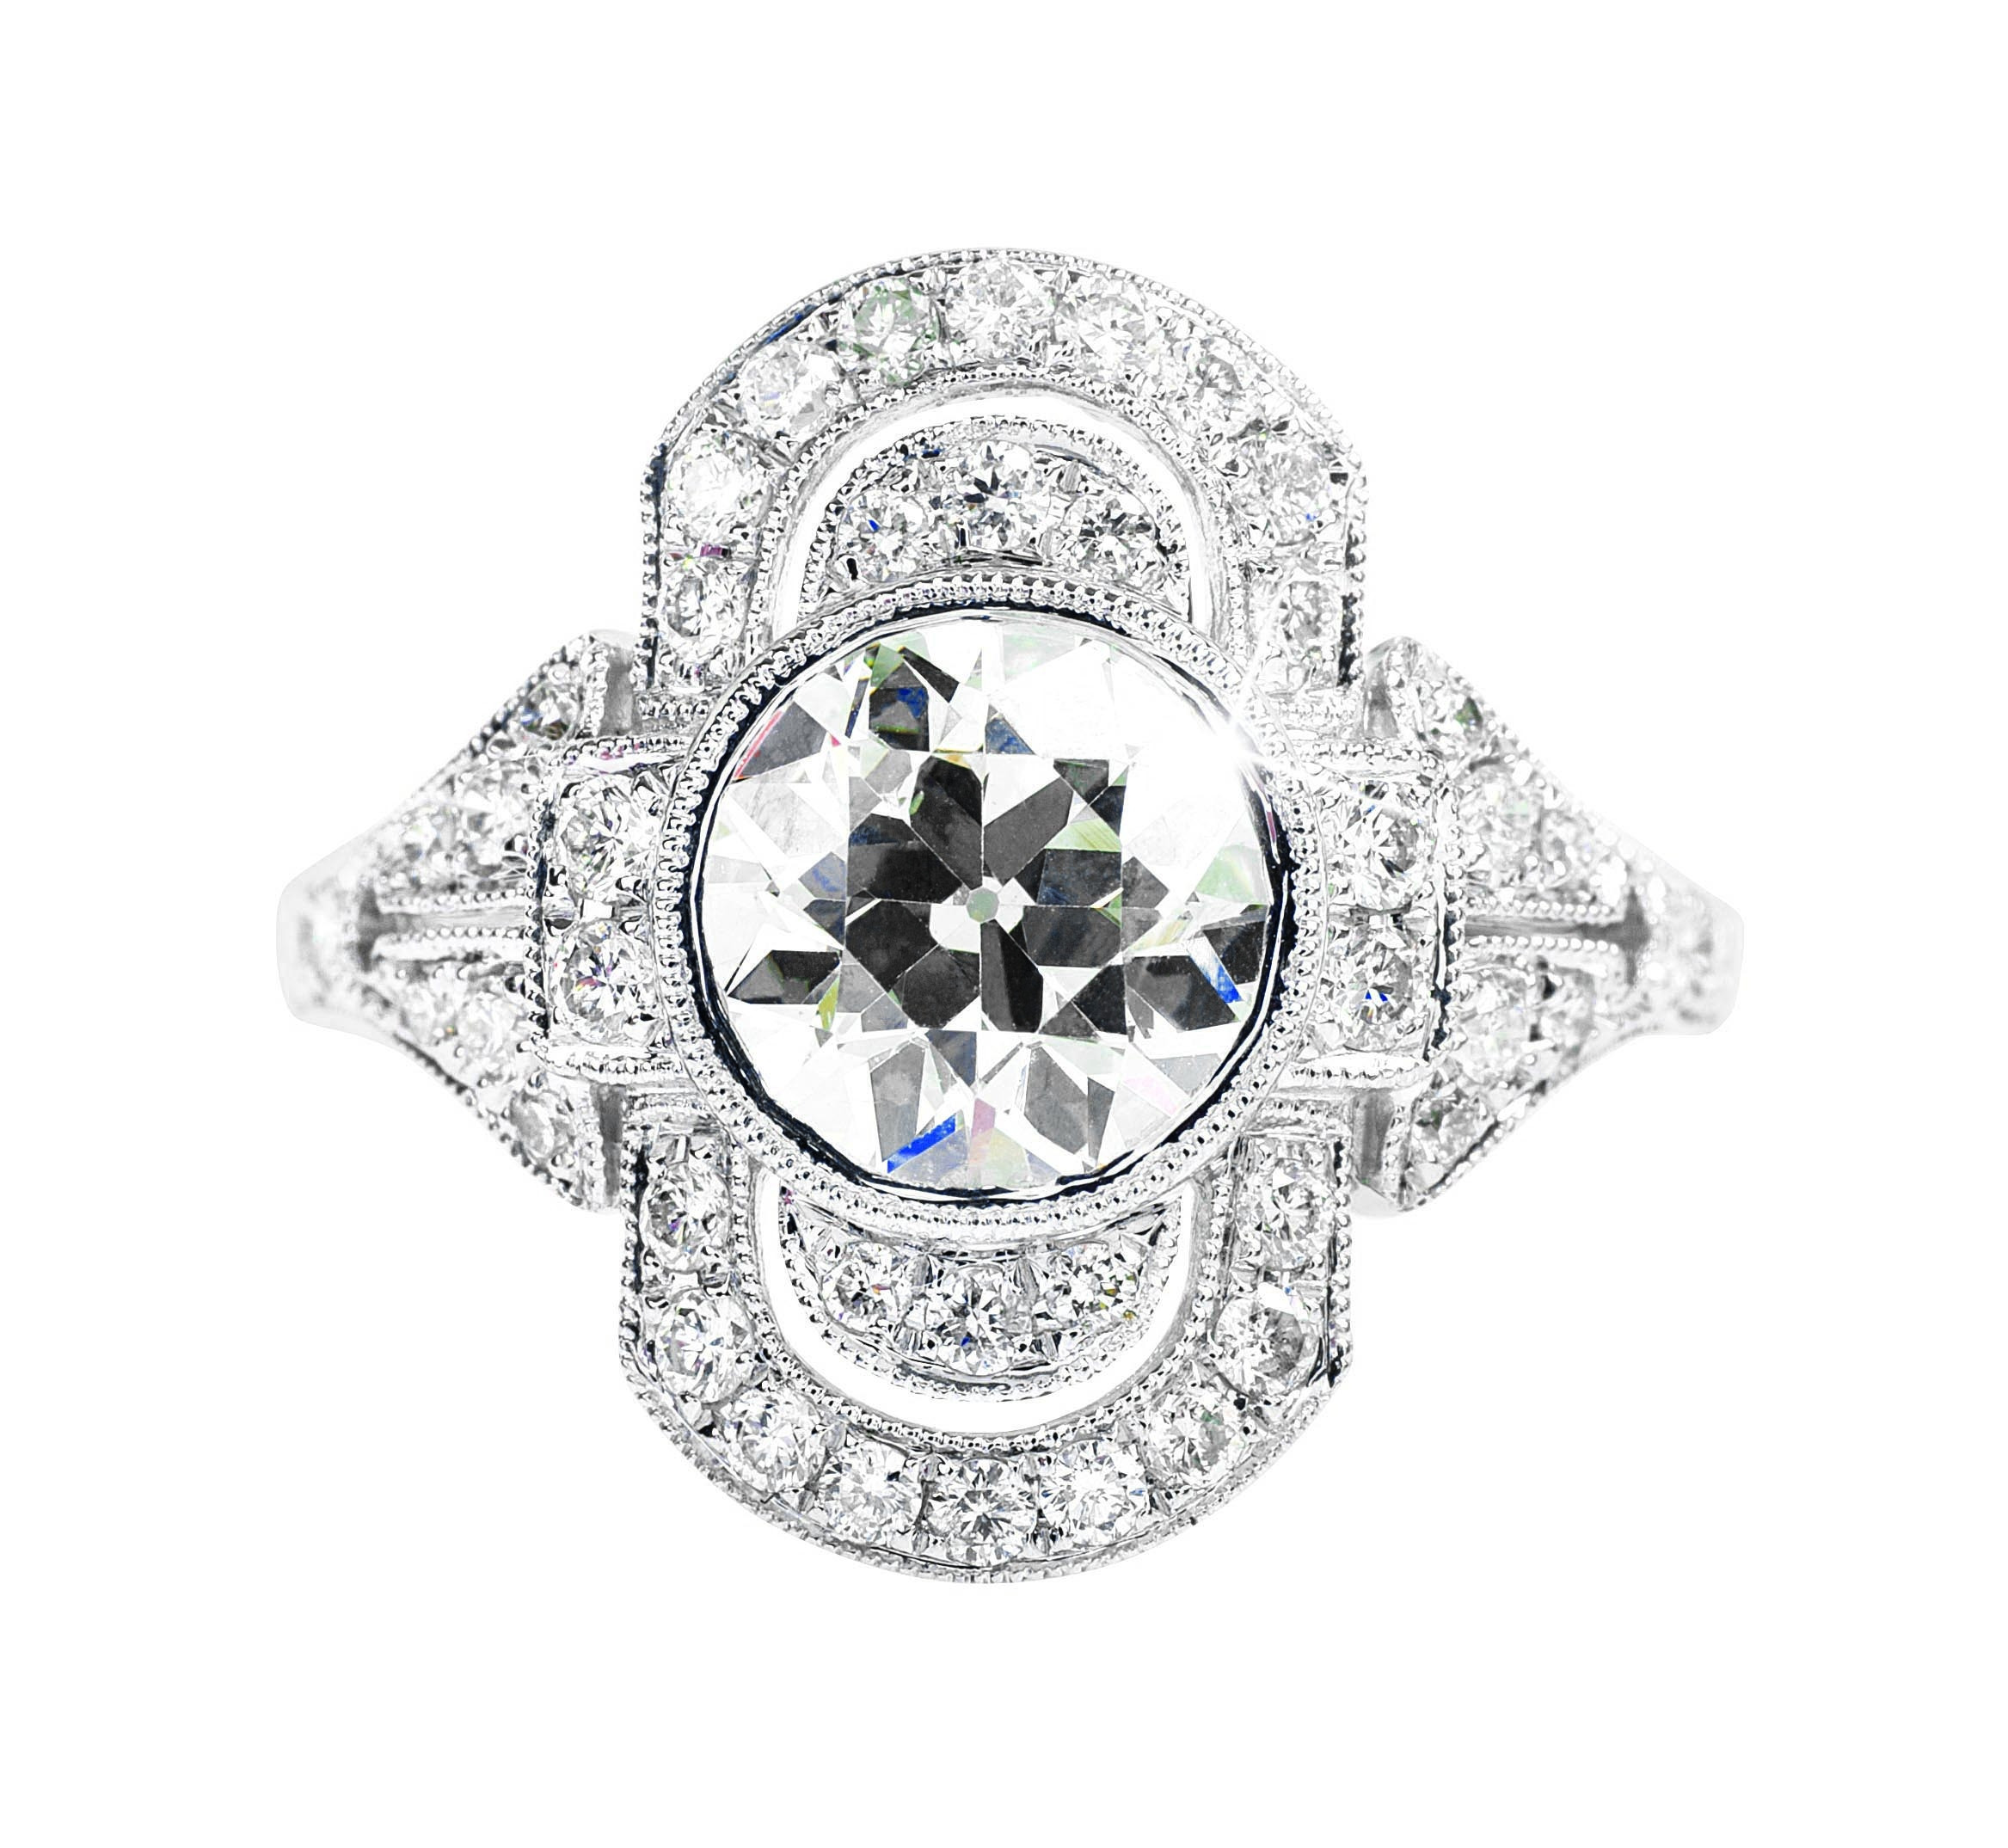 New 18k White Gold 2.53 CTW Diamond Engagement Ring